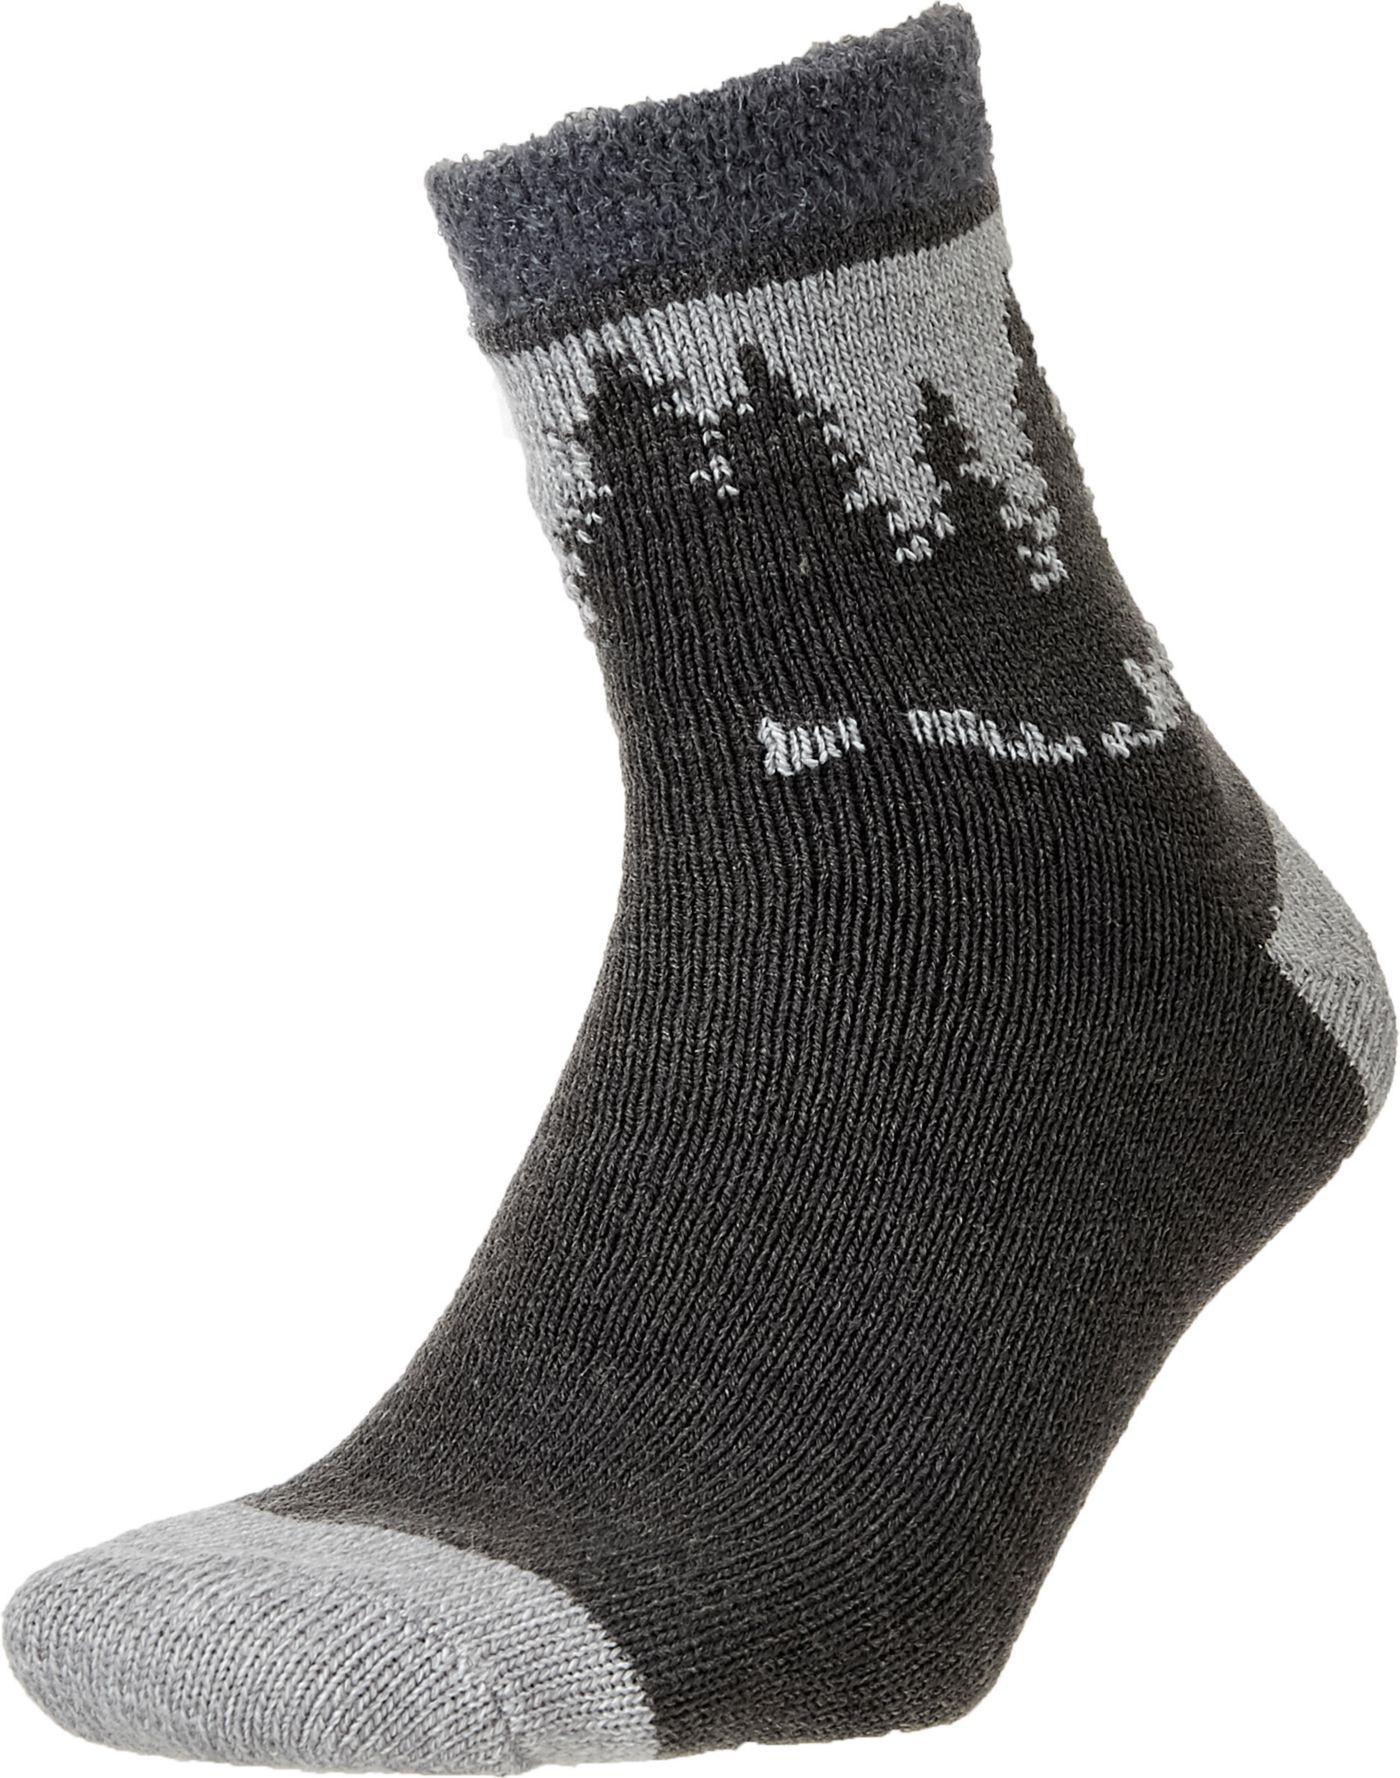 Field and Stream Men's Pine Tree Cozy Cabin Socks